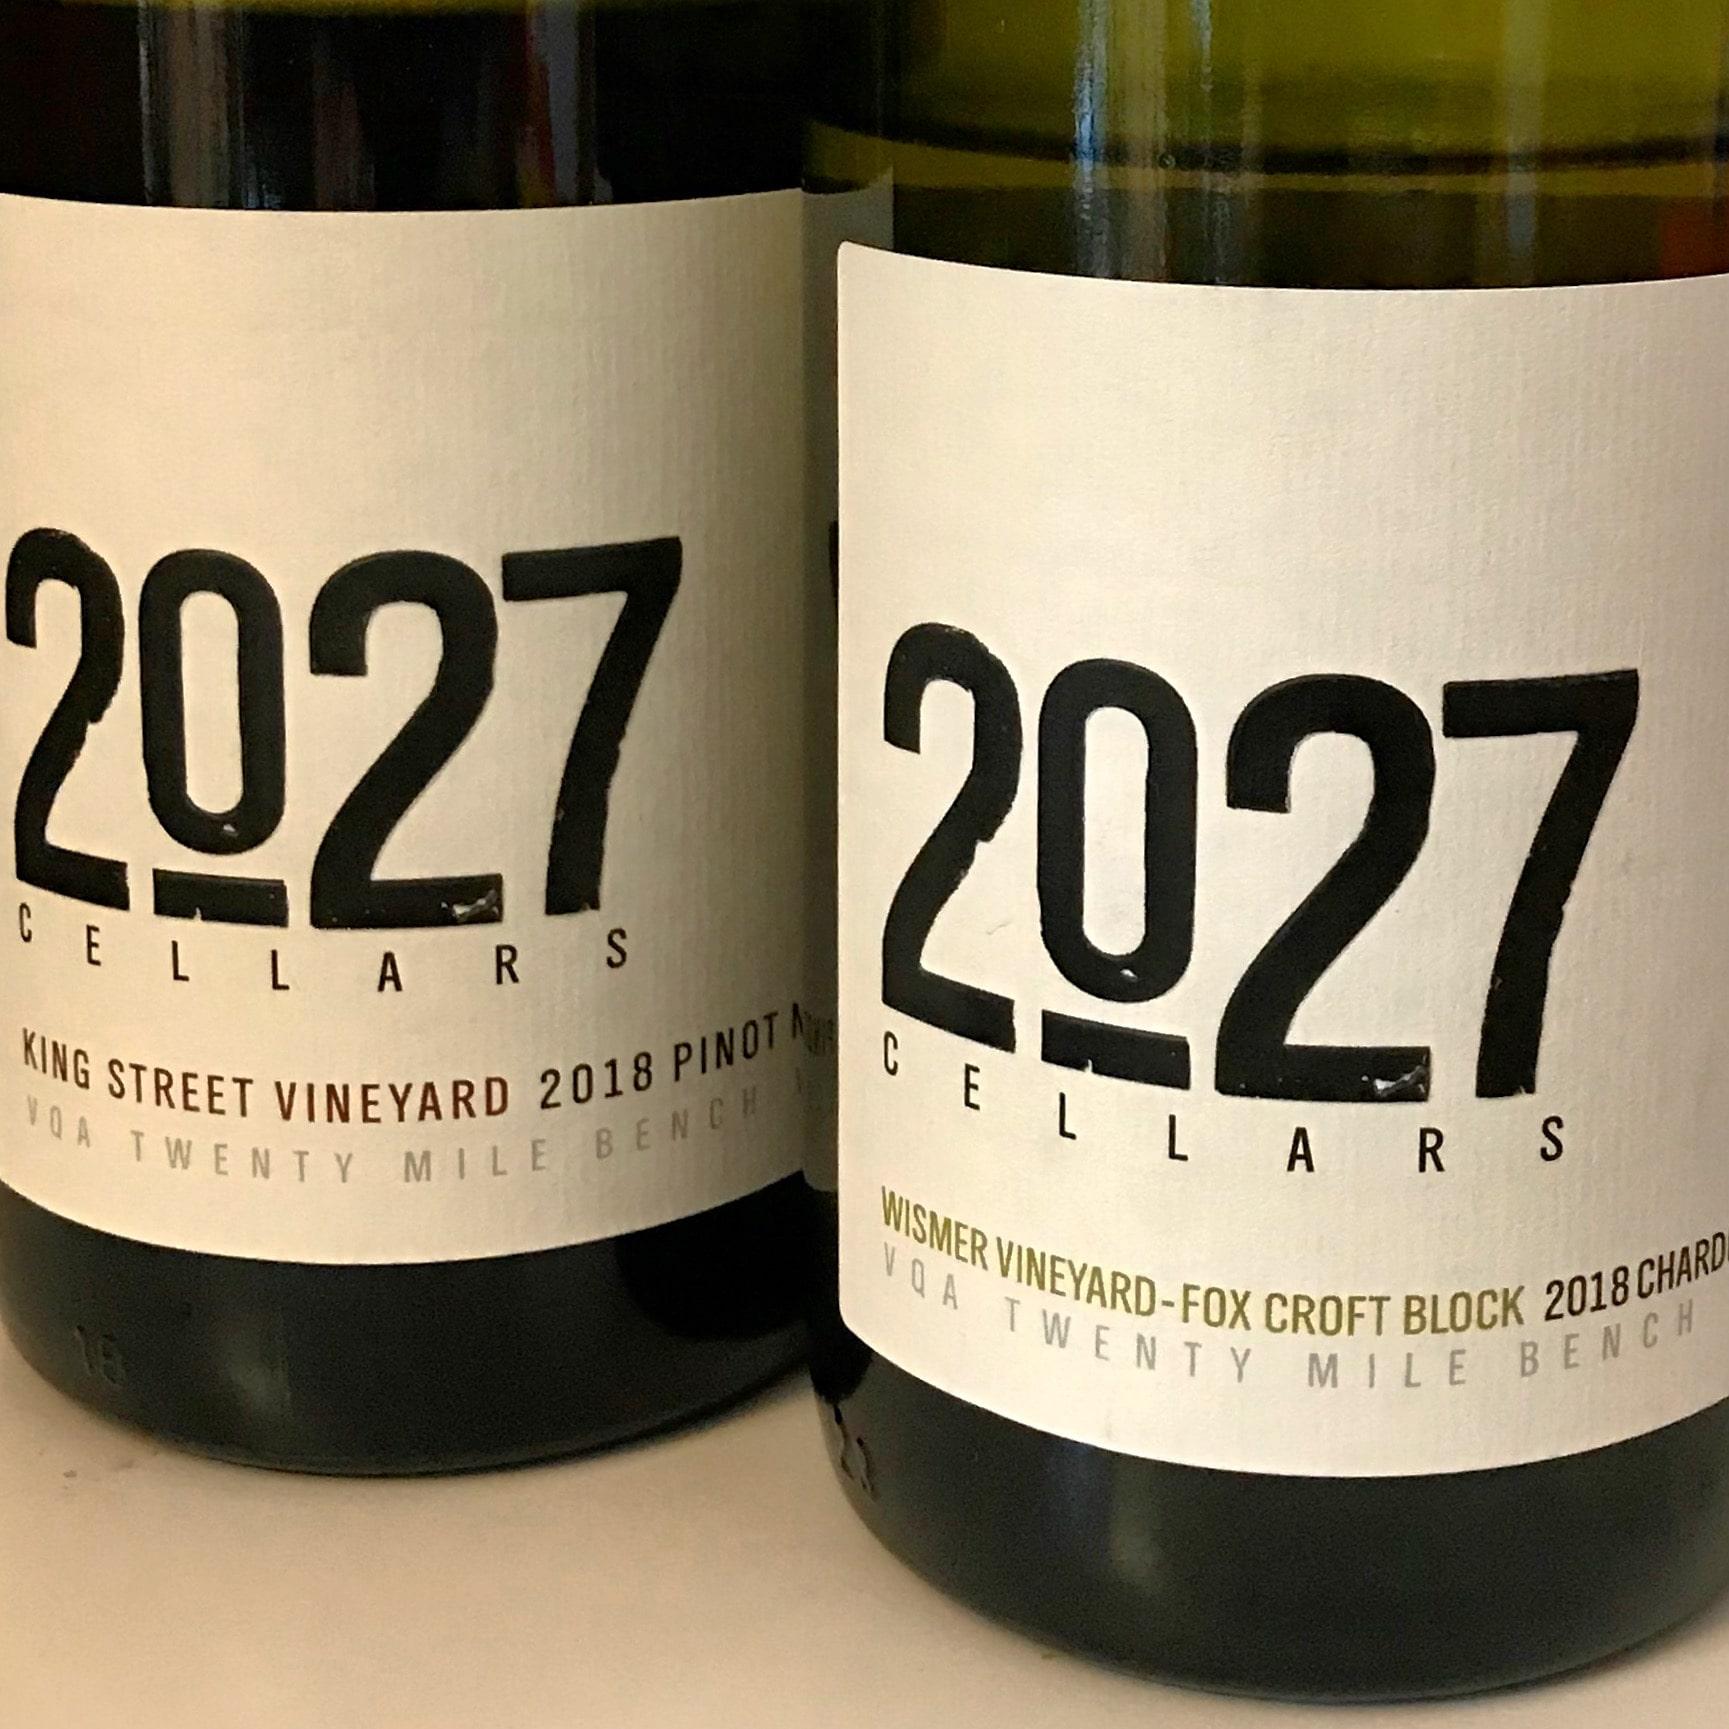 2027 Vision